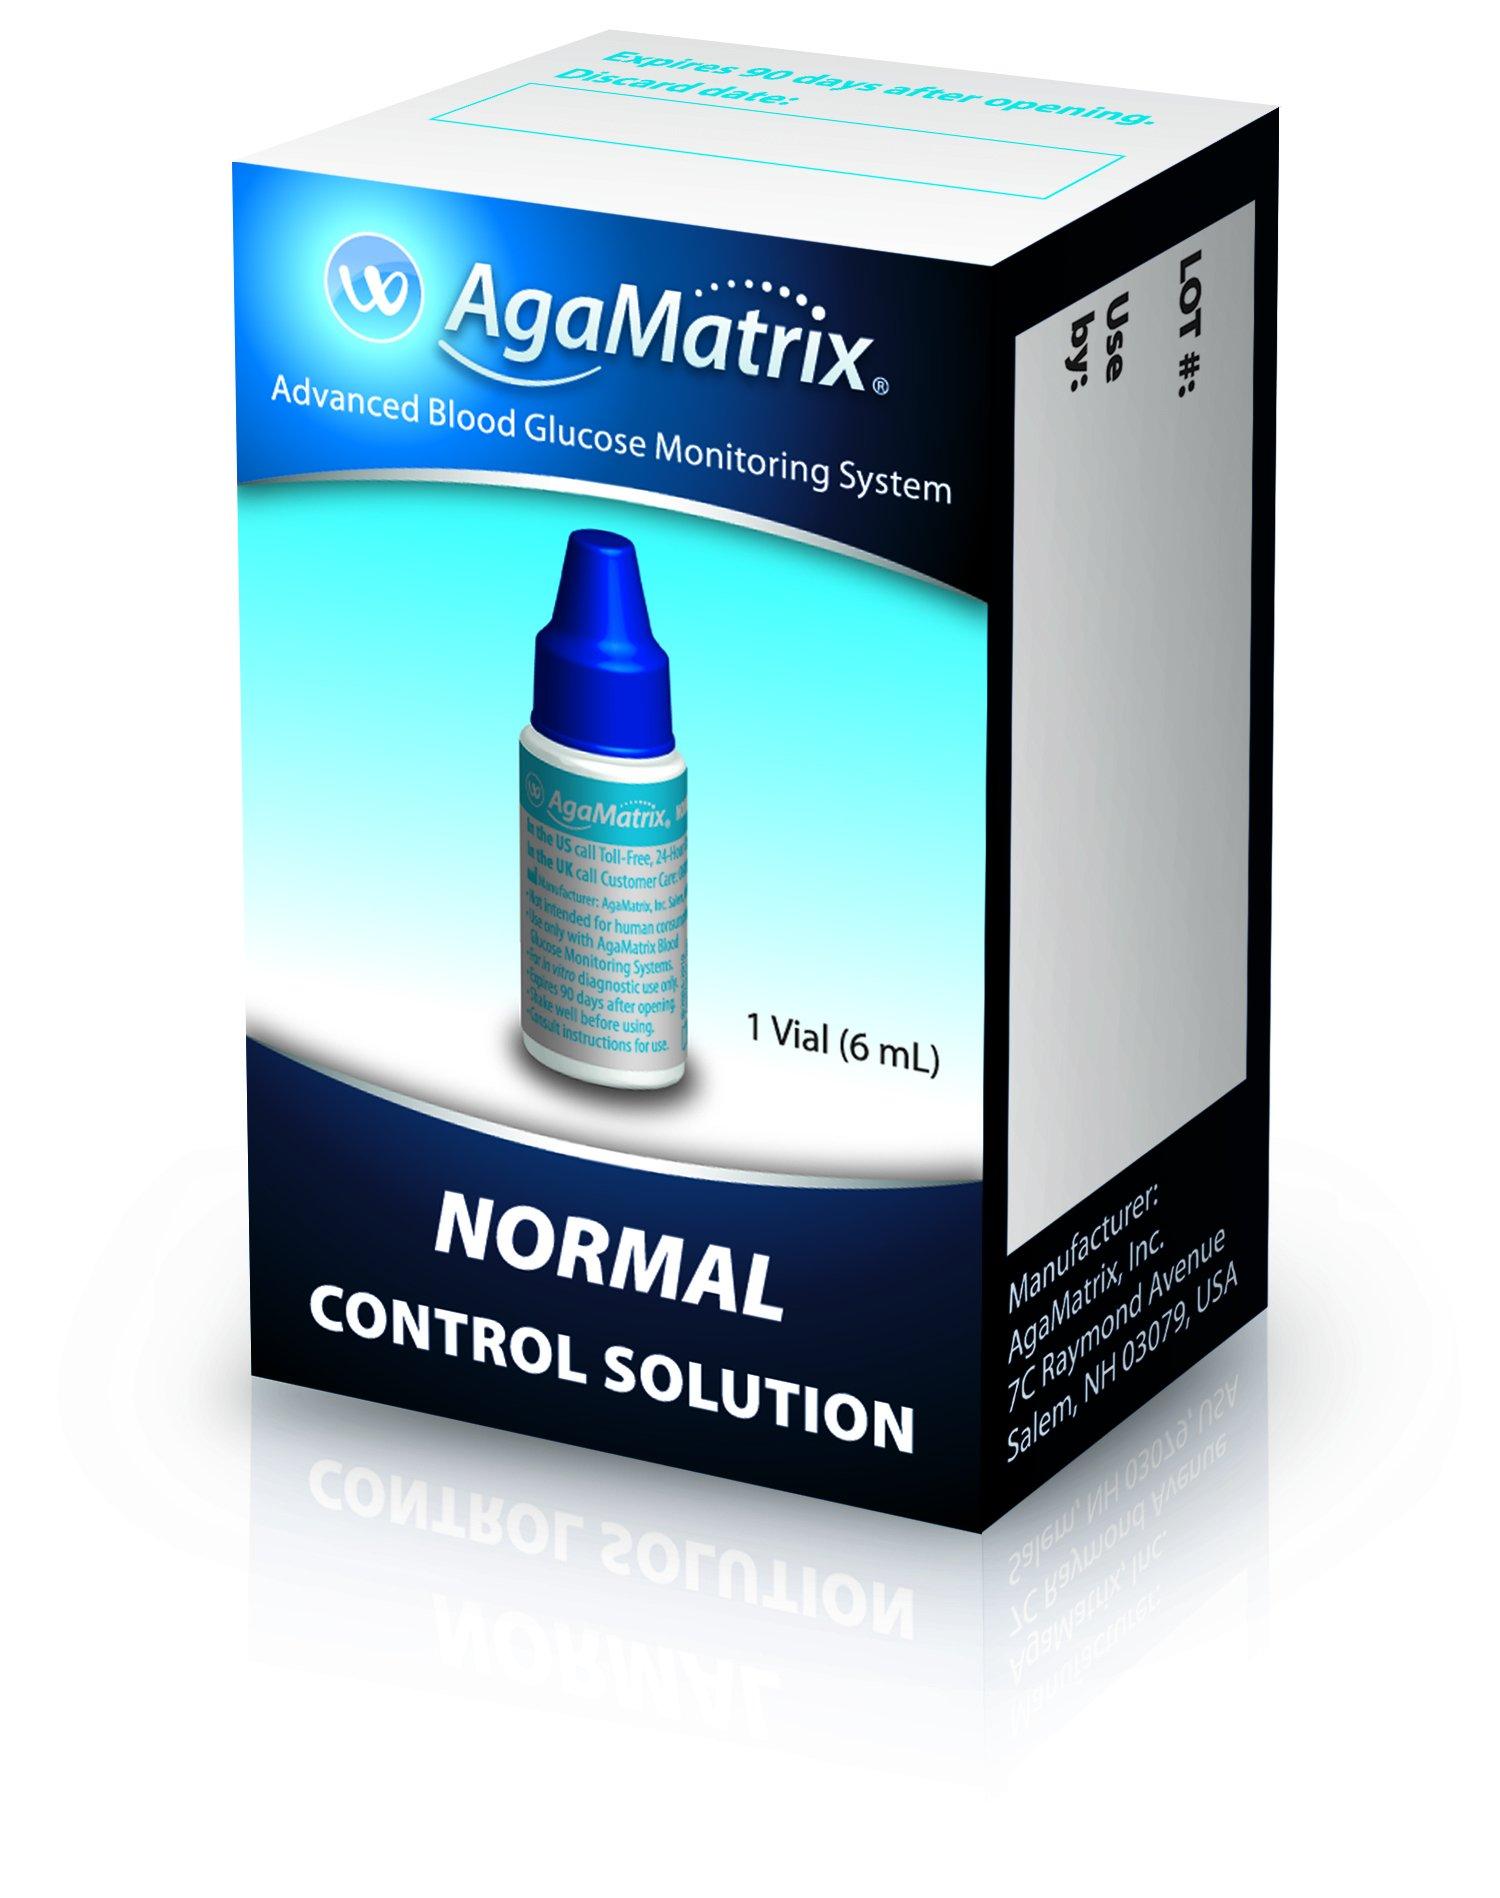 WaveSense Normal Control Solution, 1 Vial (6 ml)